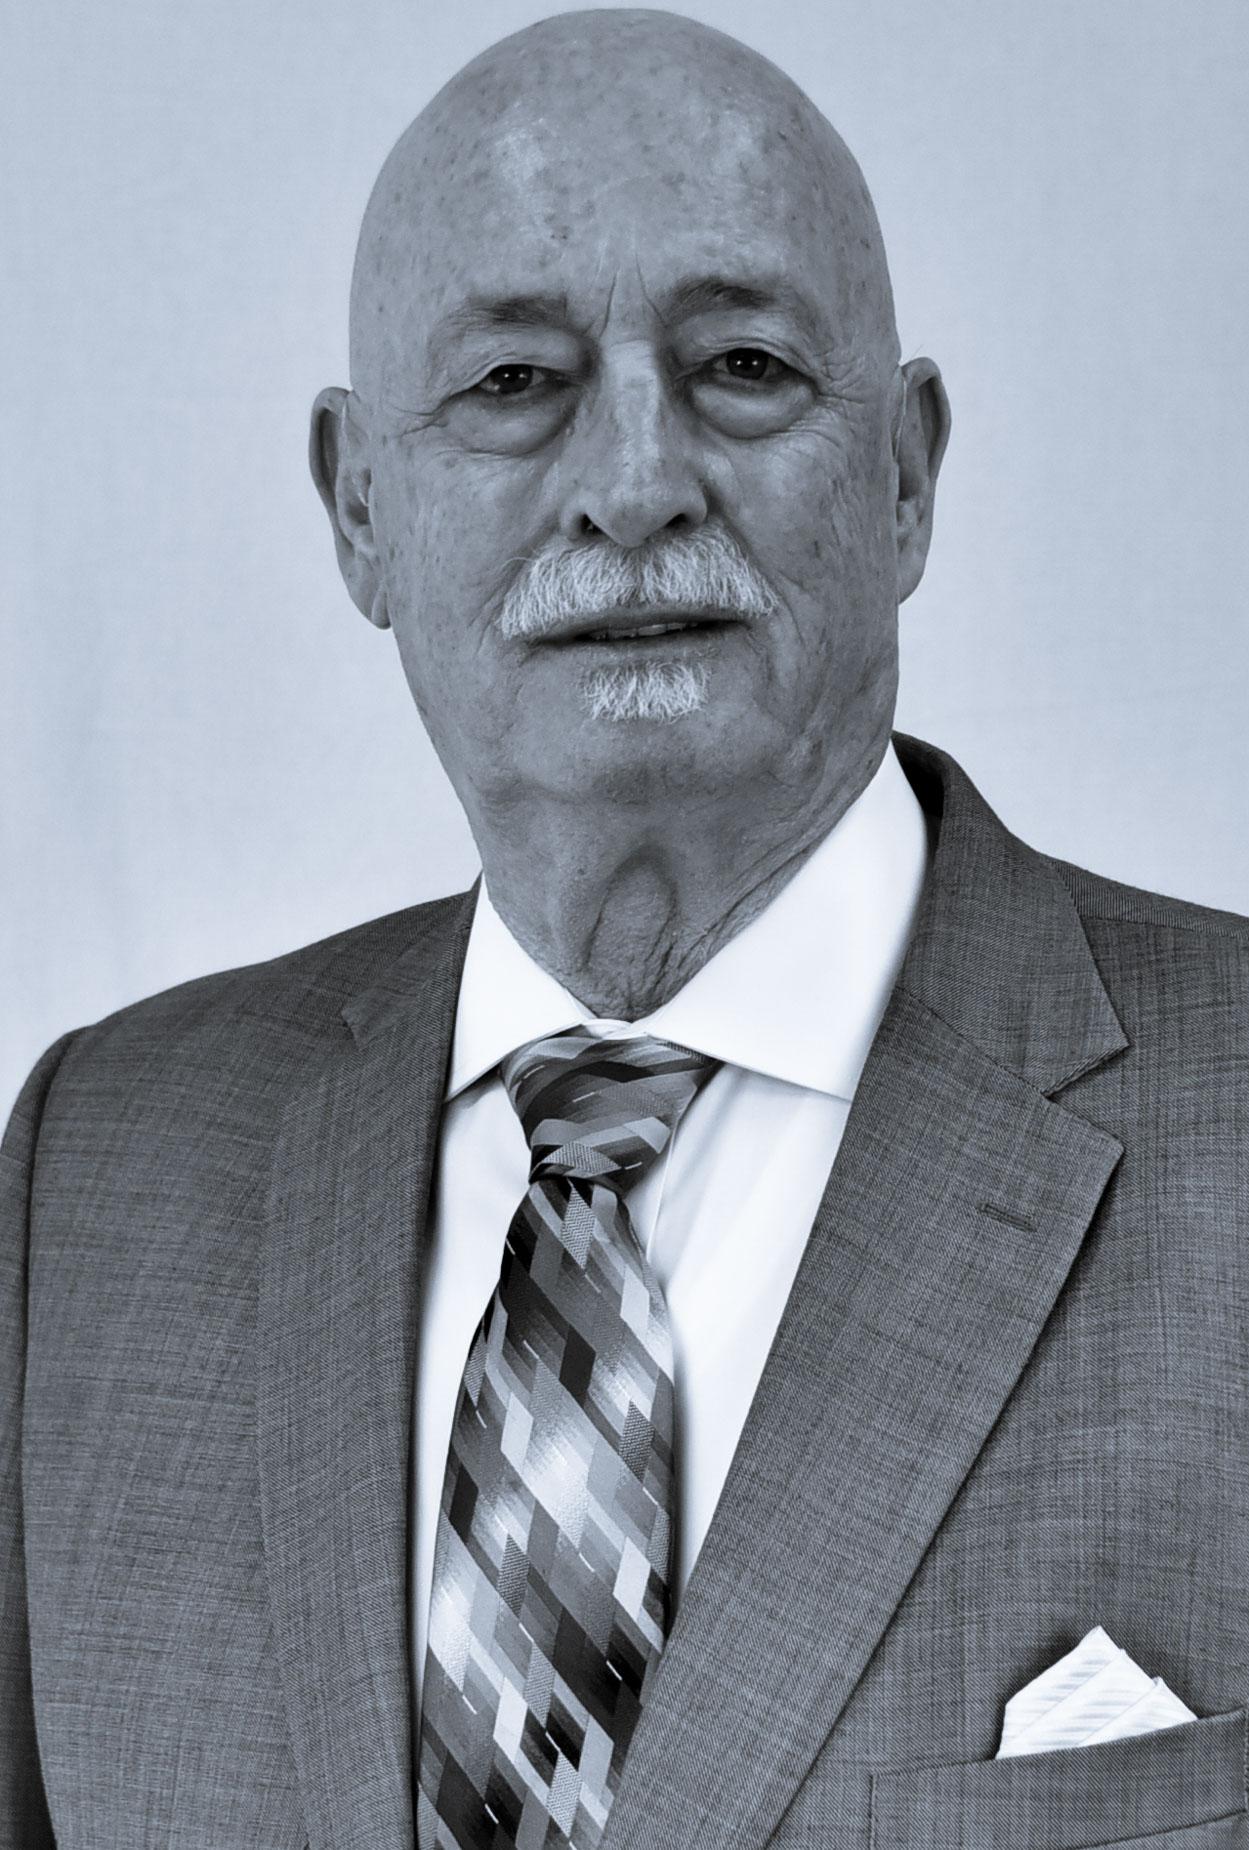 Elder Picture